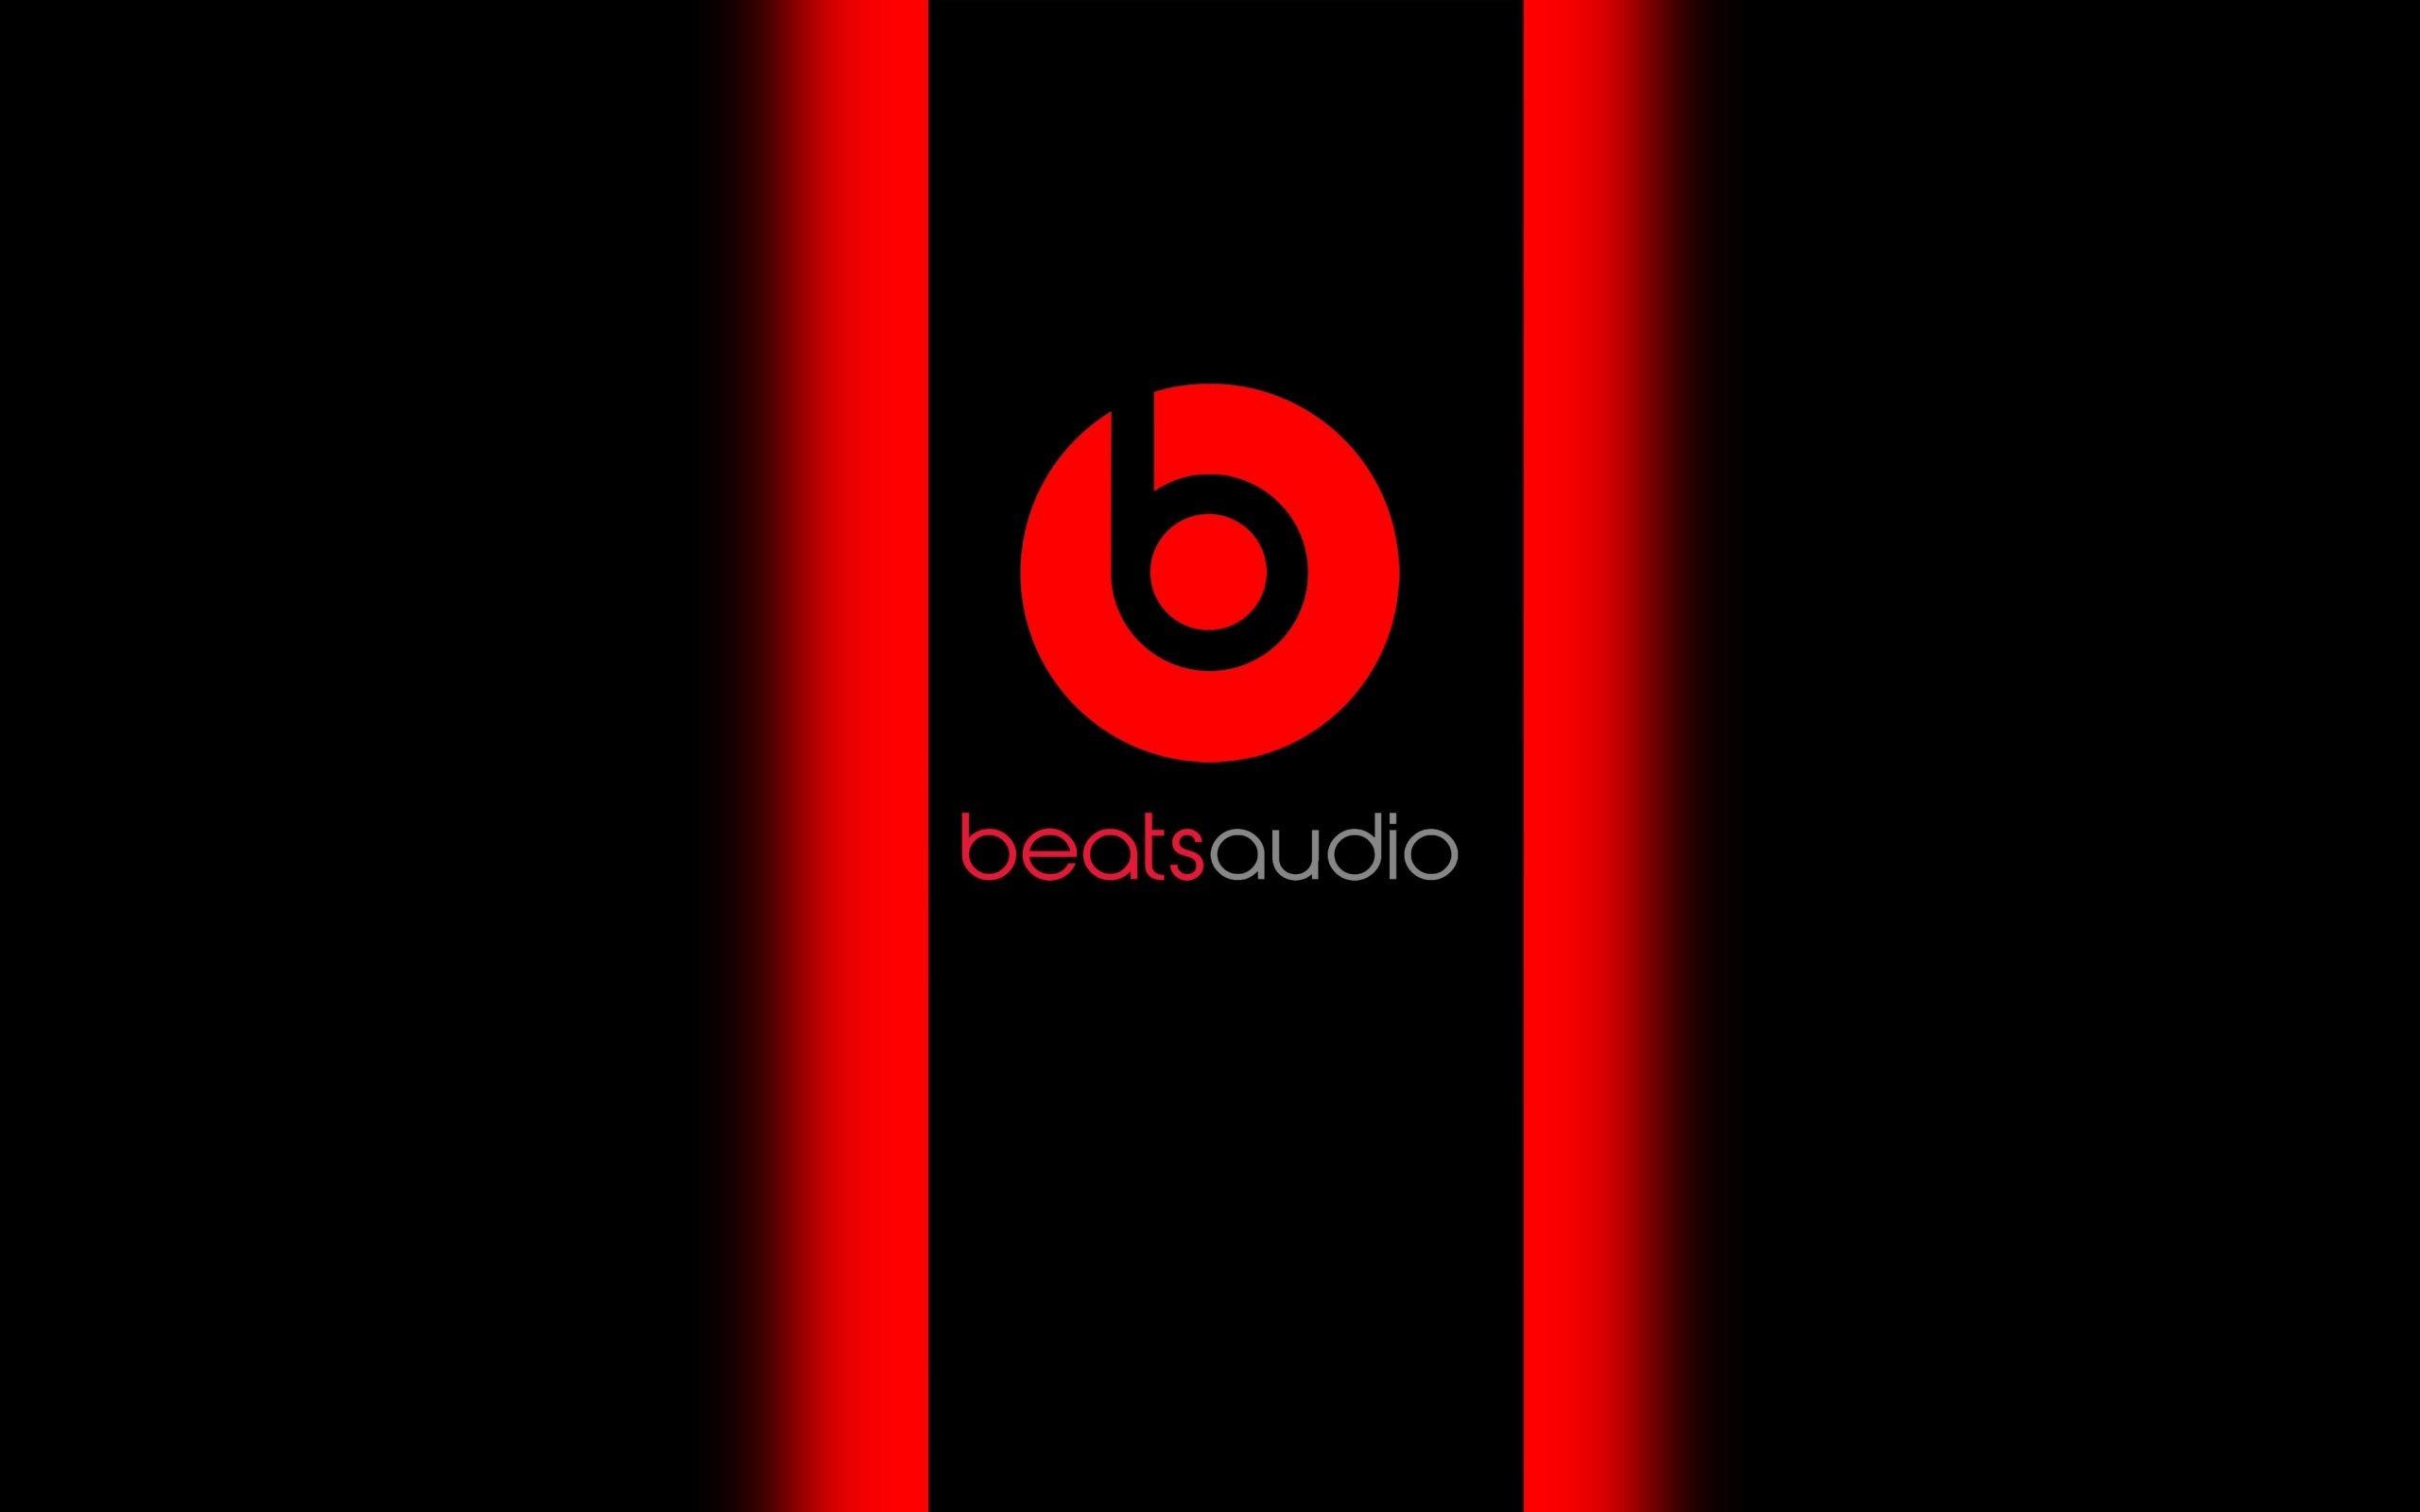 HD Background Beats Audio Logo Red Black Symbol Wallpaper .